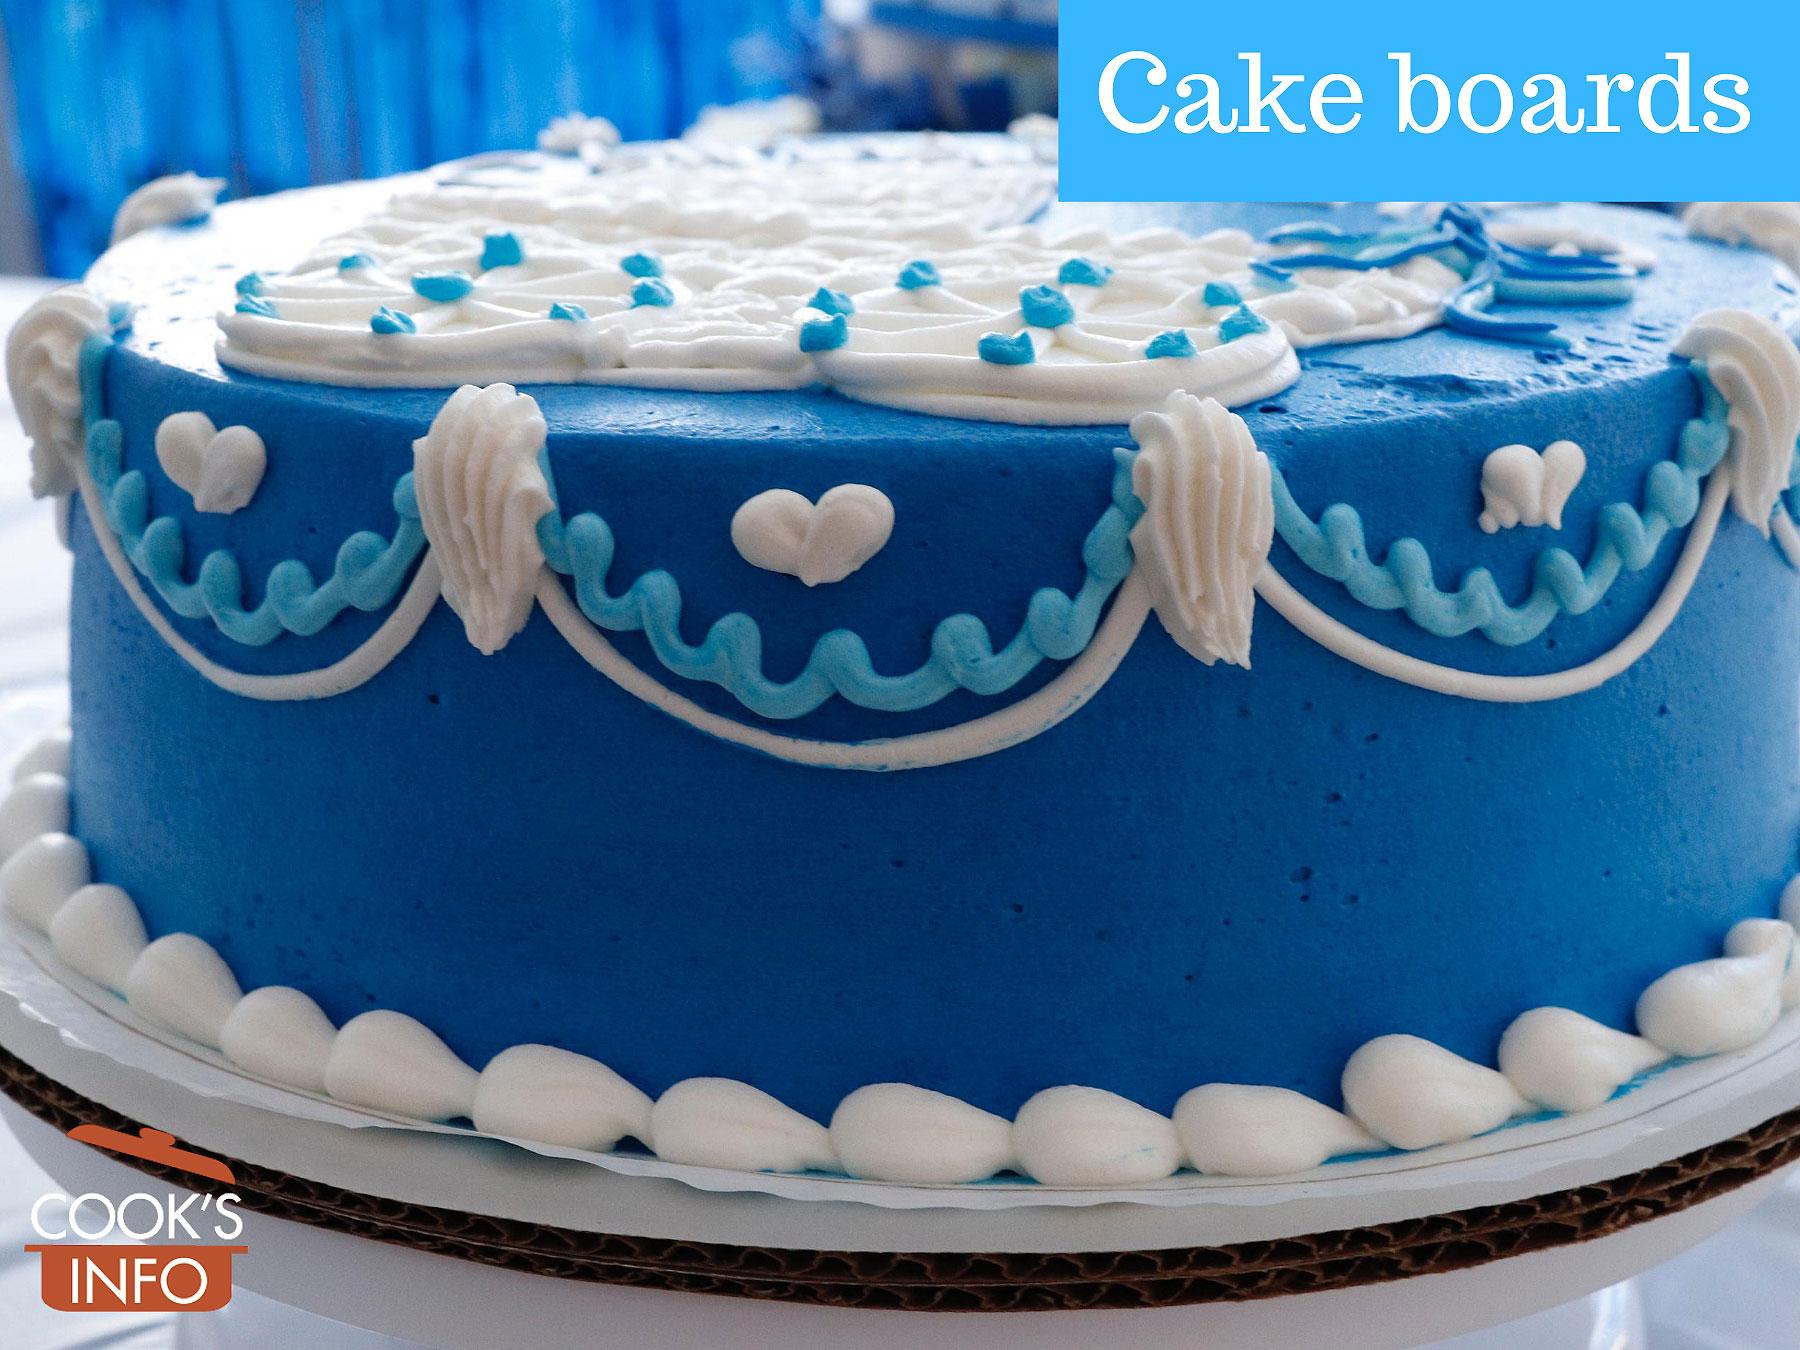 Blue cake on corrugated cardboard cake board